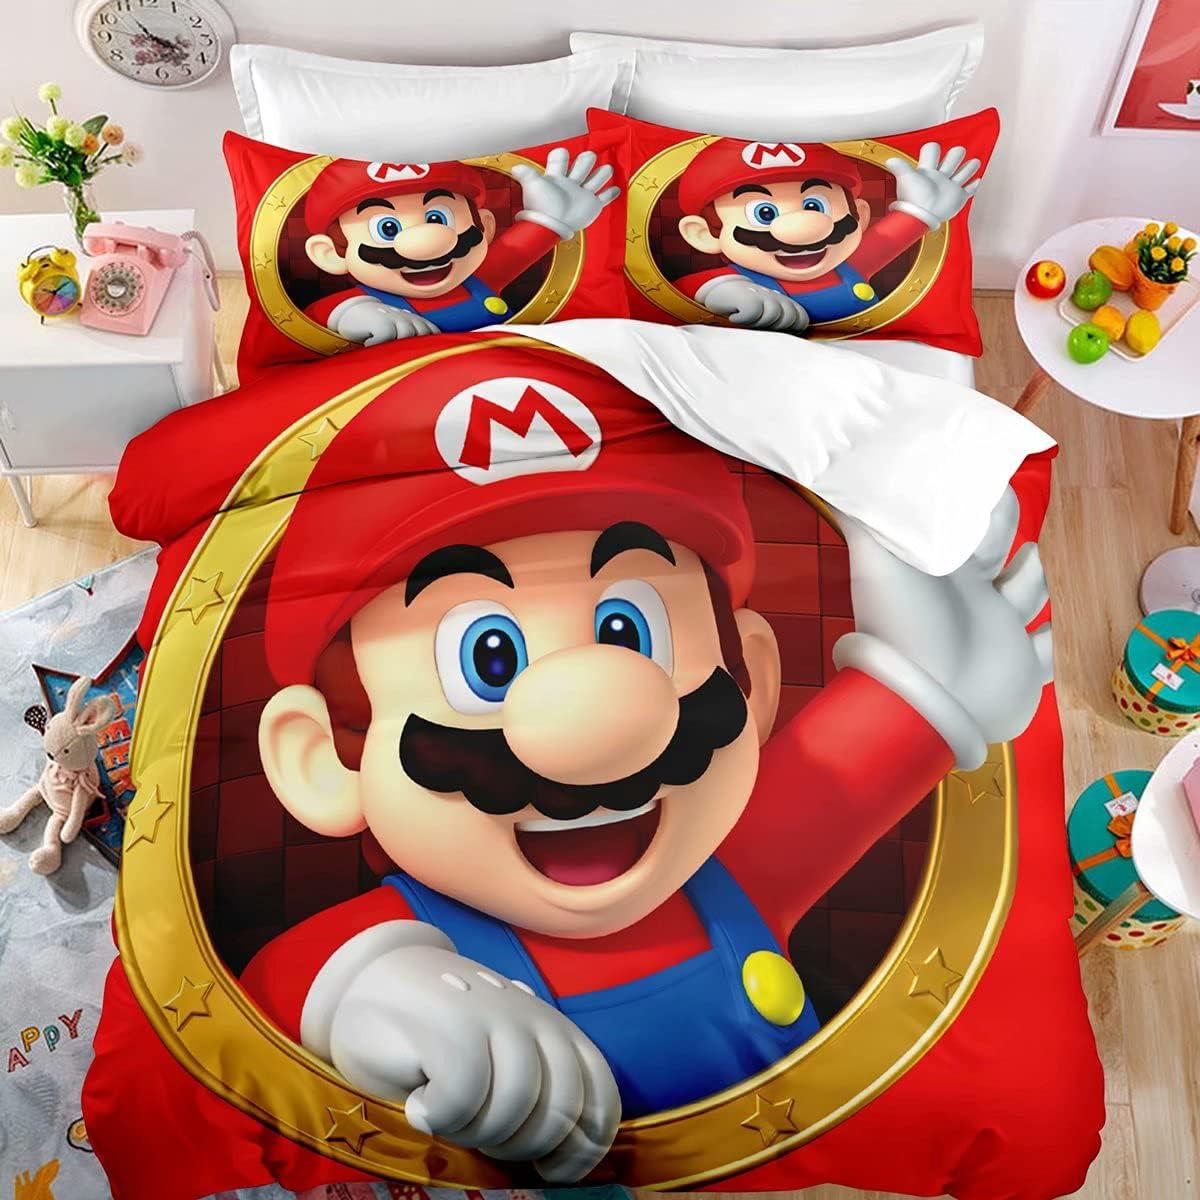 Kolidier Super Mario Bedding Duvet Max 52% OFF Sets Kids Outstanding Cartoon Cover